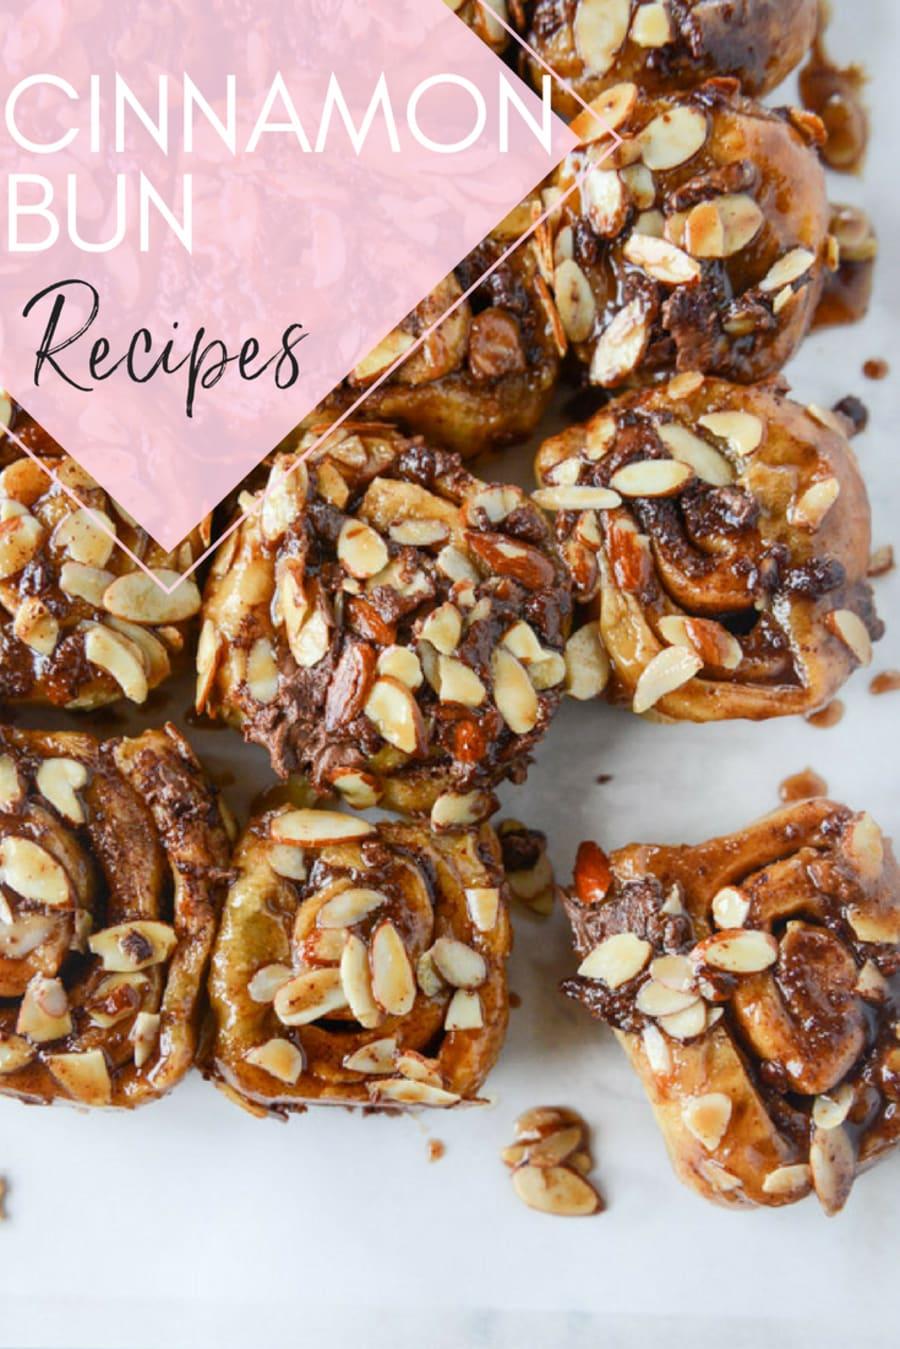 6 Cinnamon Bun Recipes To Keep You Nice And